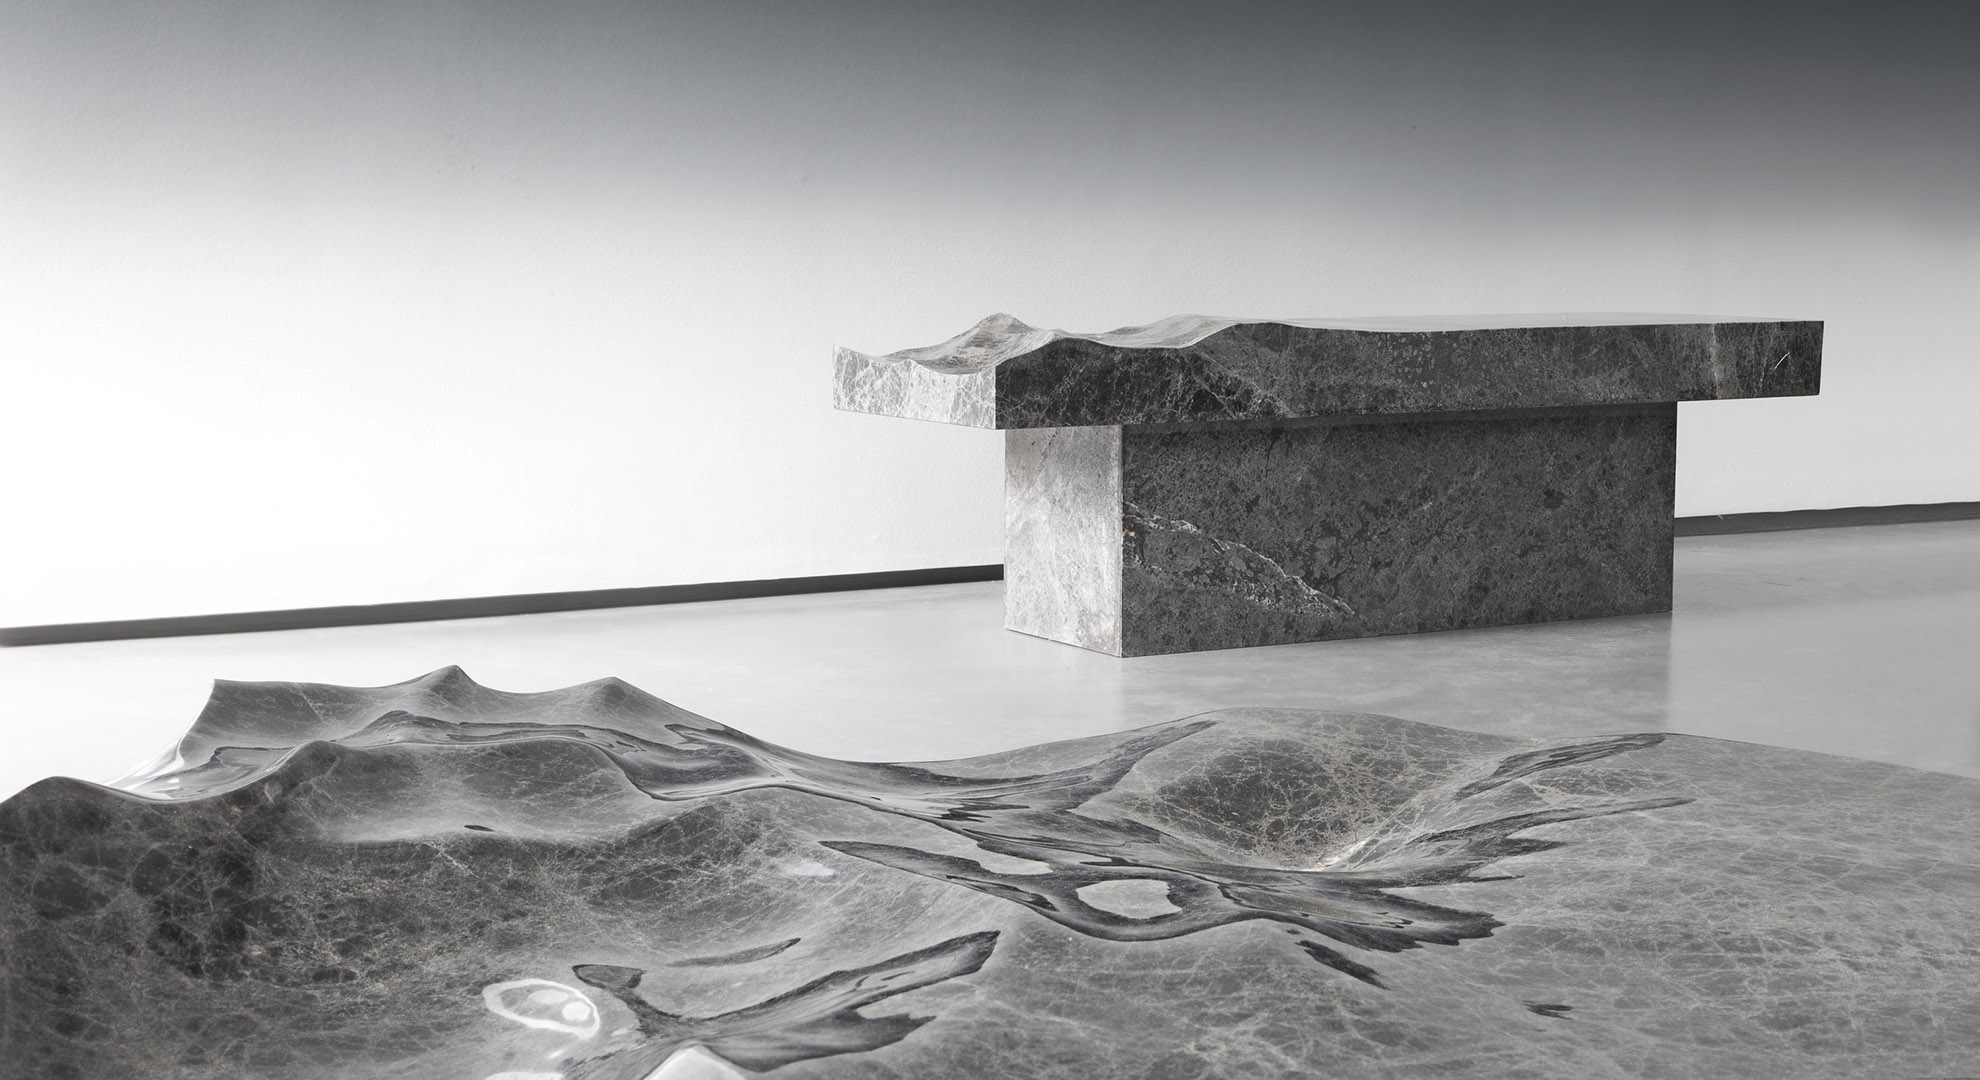 Ocean artwork Exhibition: Ocean Memories by Mathieu Lehanneur